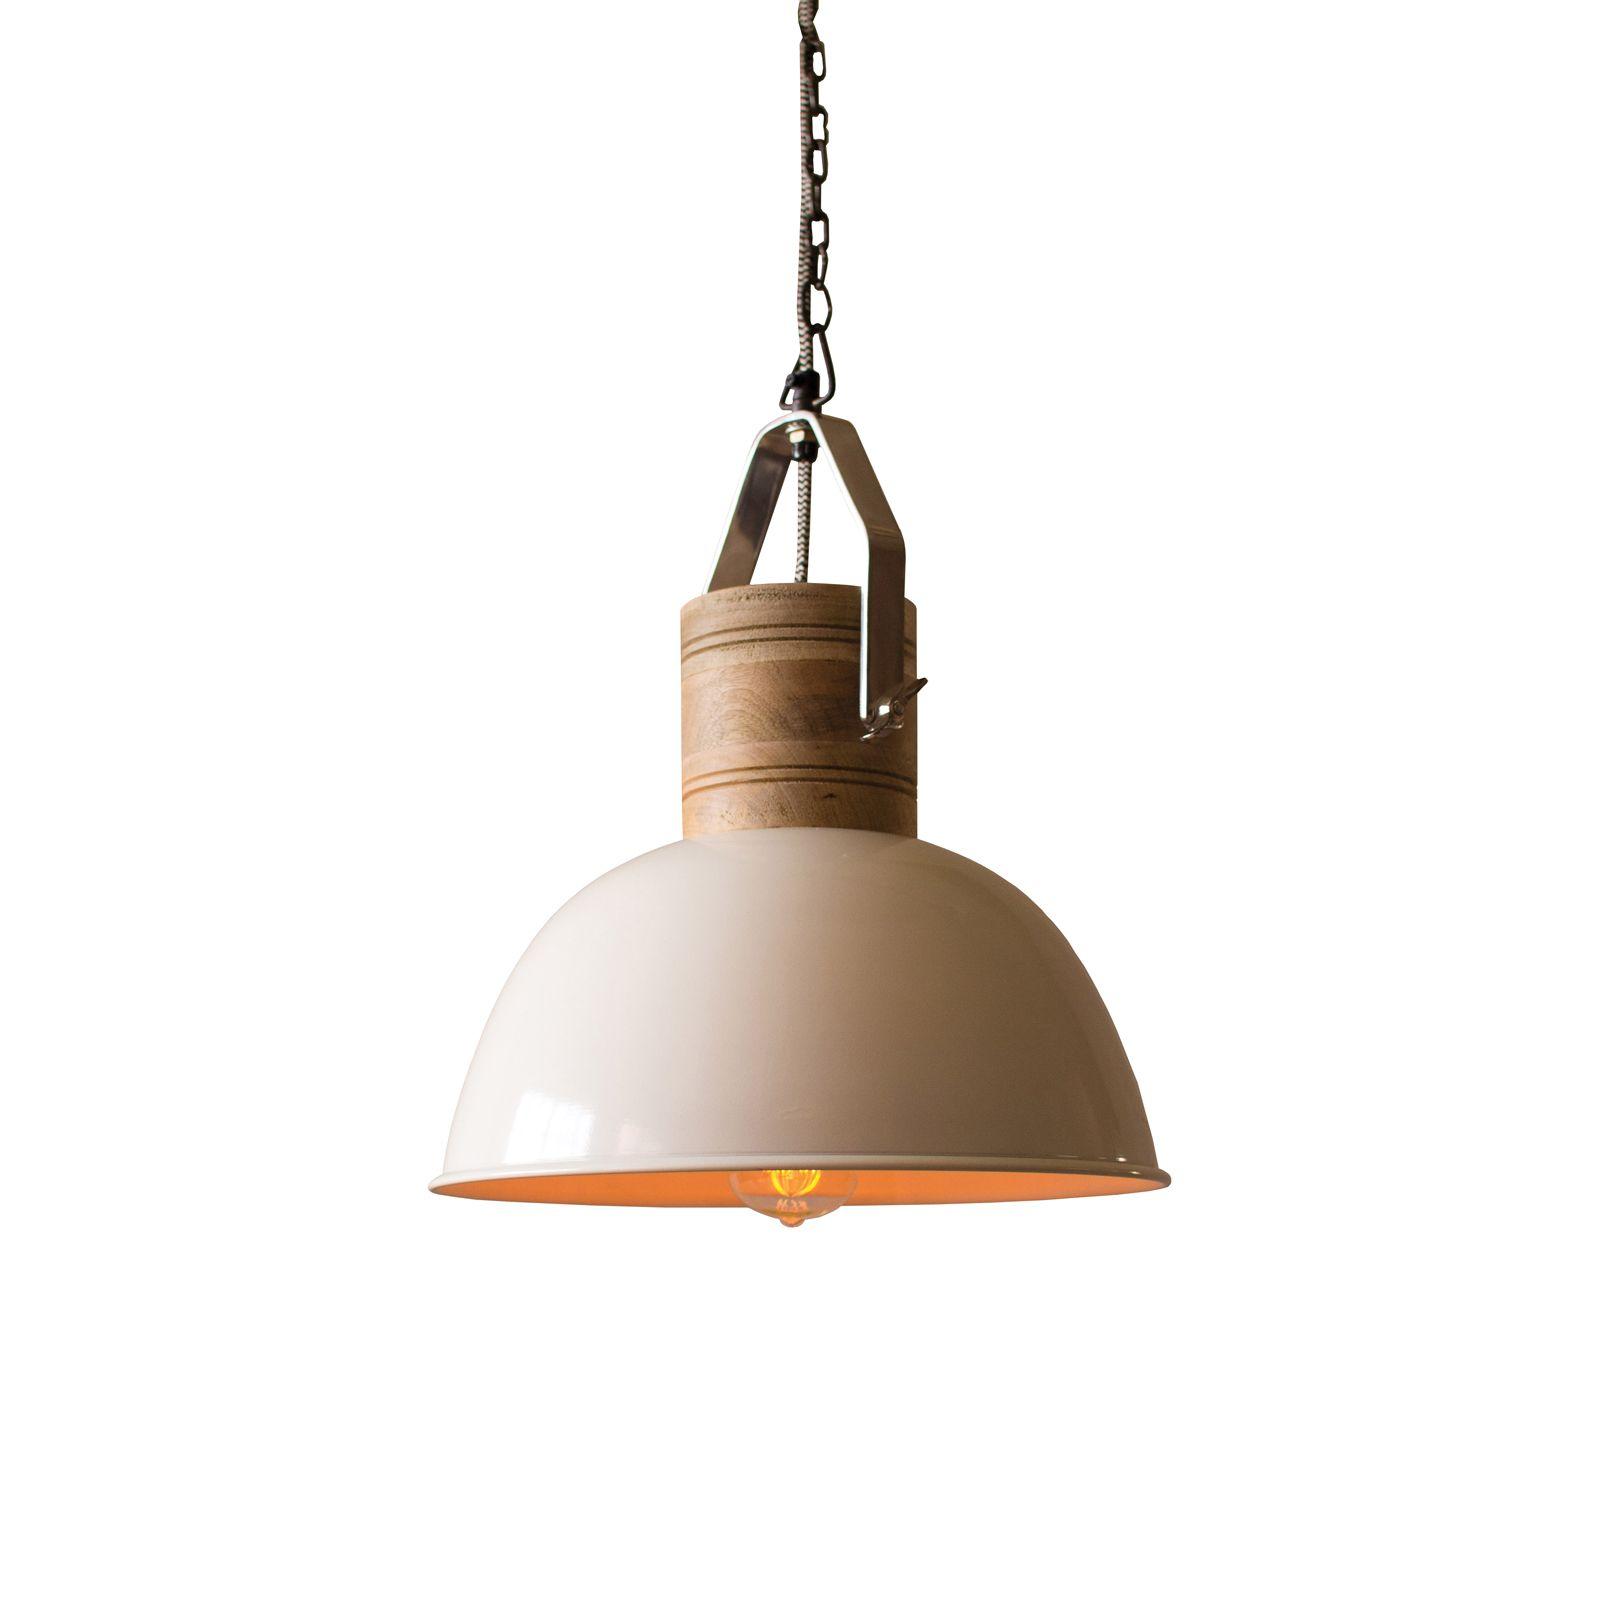 Enjoy a farmhouse-inspired dome enamel pendant light with elegant ...